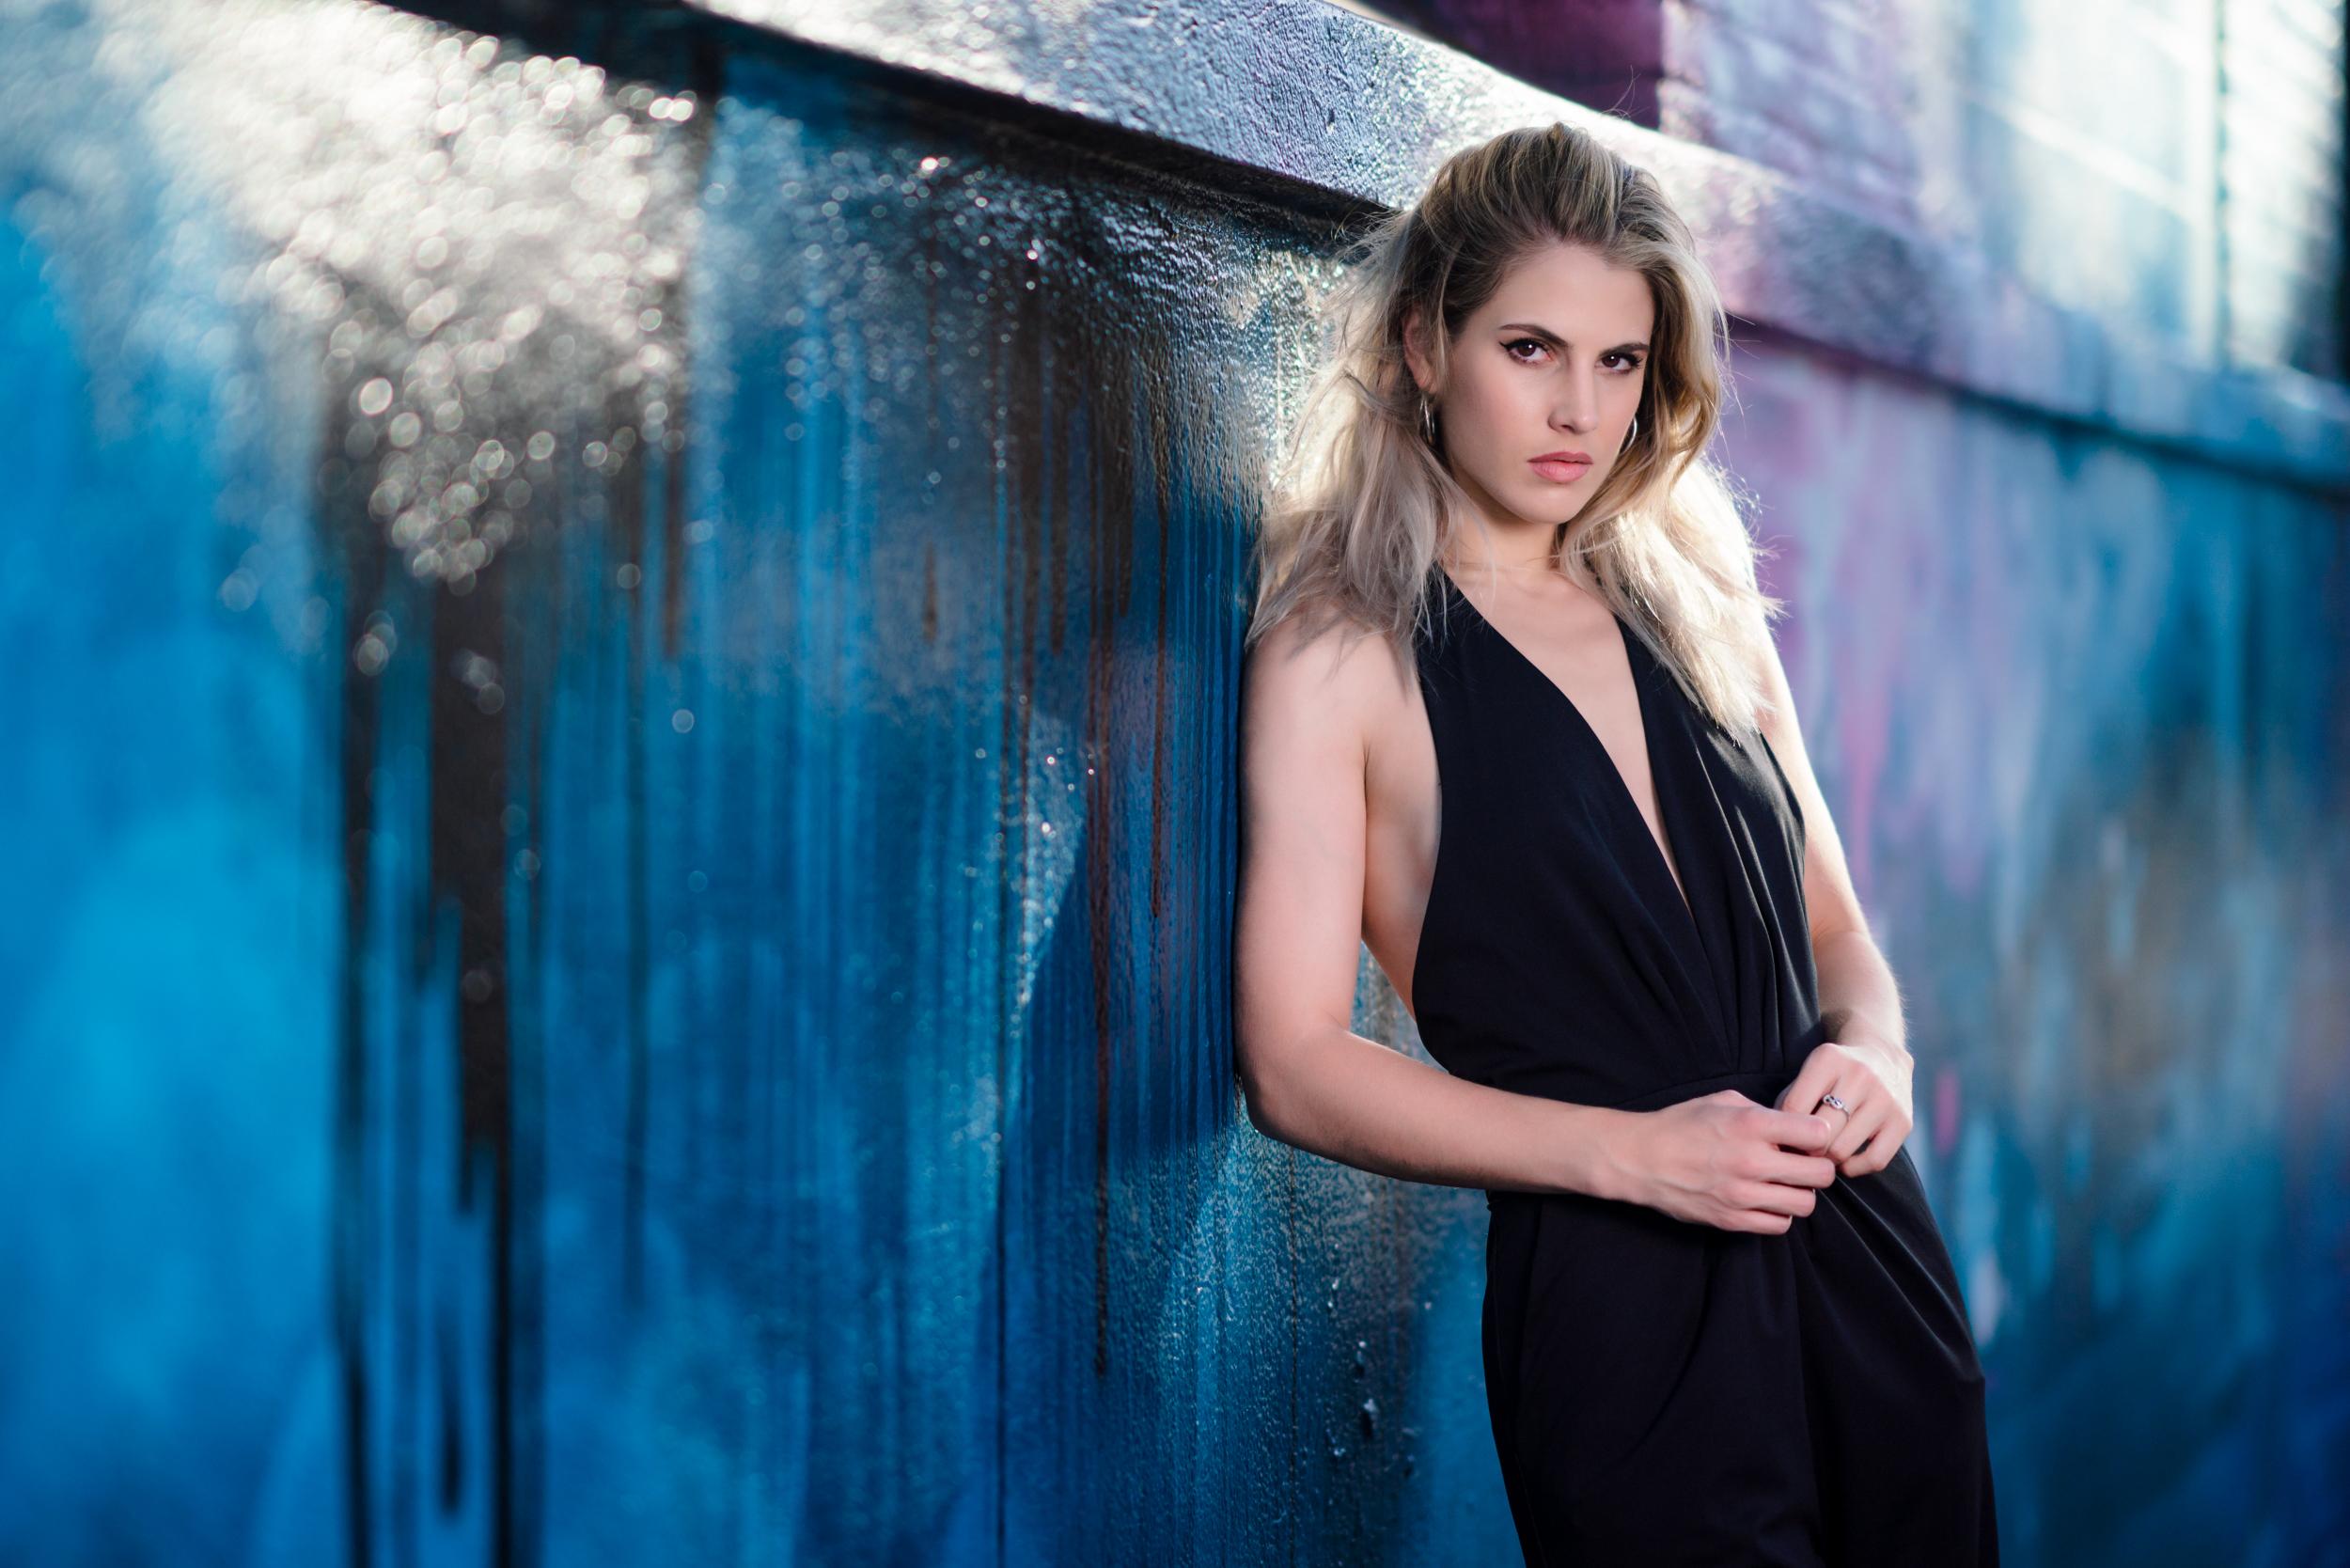 Caitlyn Rose | Portraits - Oct 19, 2018